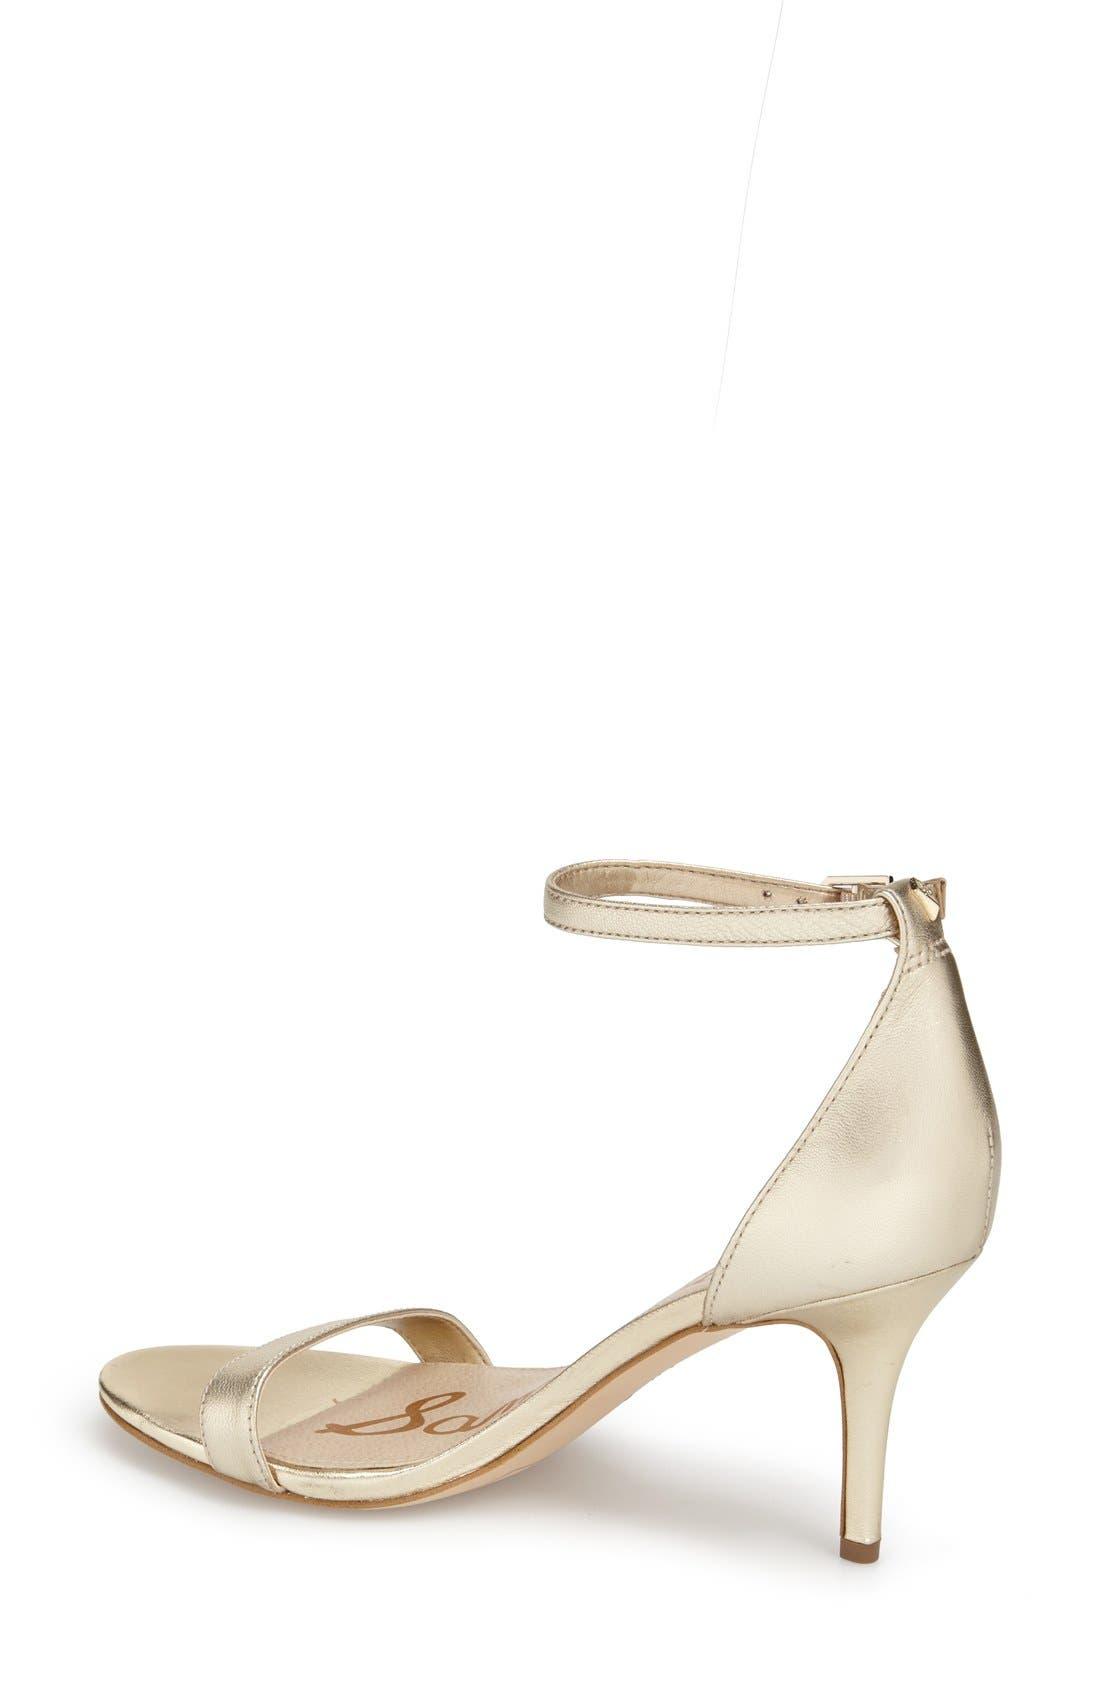 ,                             'Patti' Ankle Strap Sandal,                             Alternate thumbnail 209, color,                             900